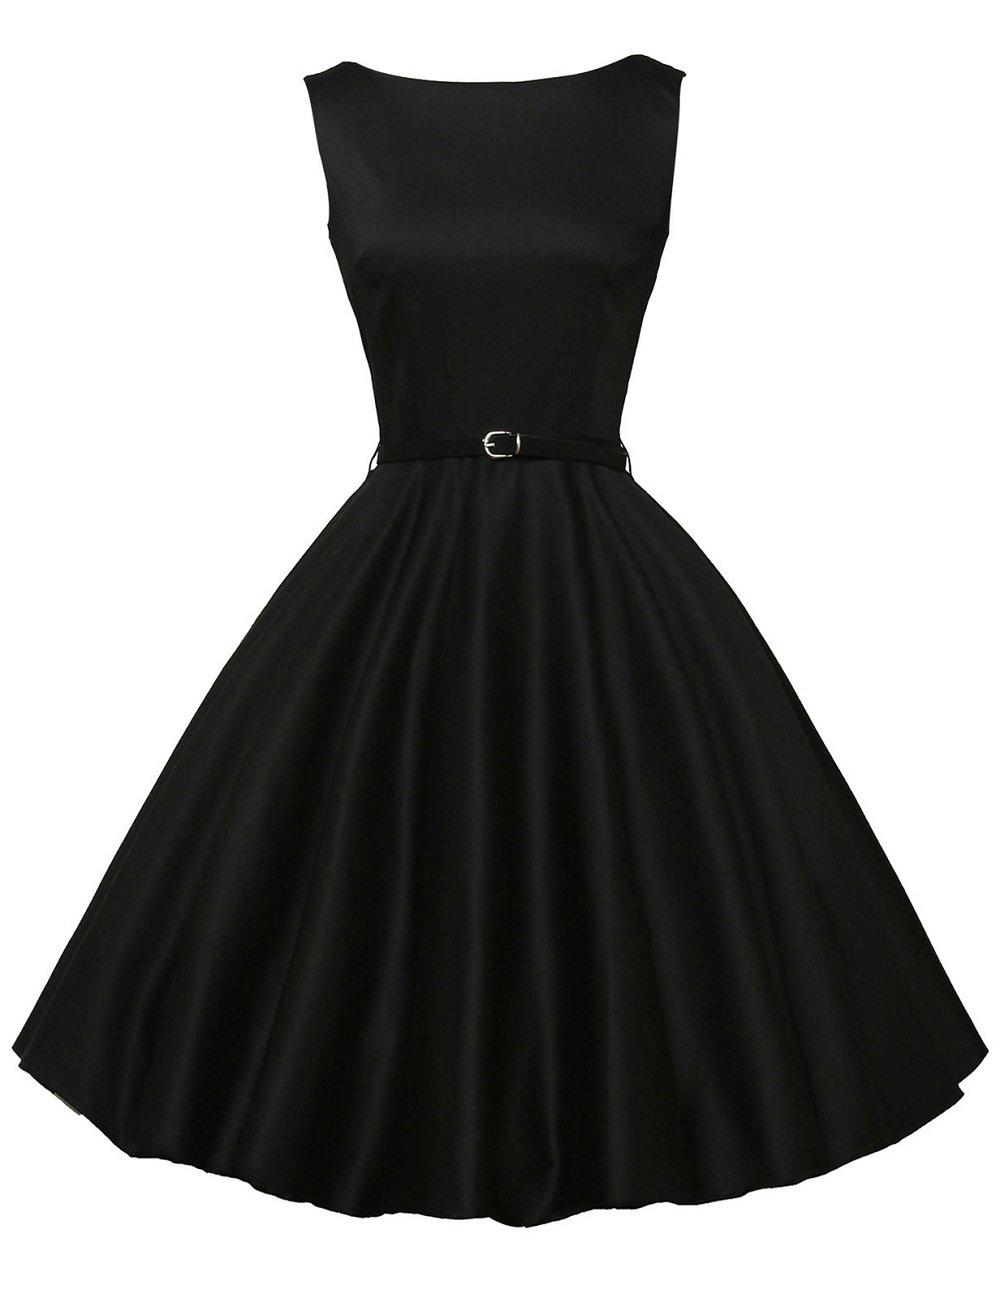 50's Vintage Dresses for Women with Belt Black Size L F-13 by GRACE KARIN